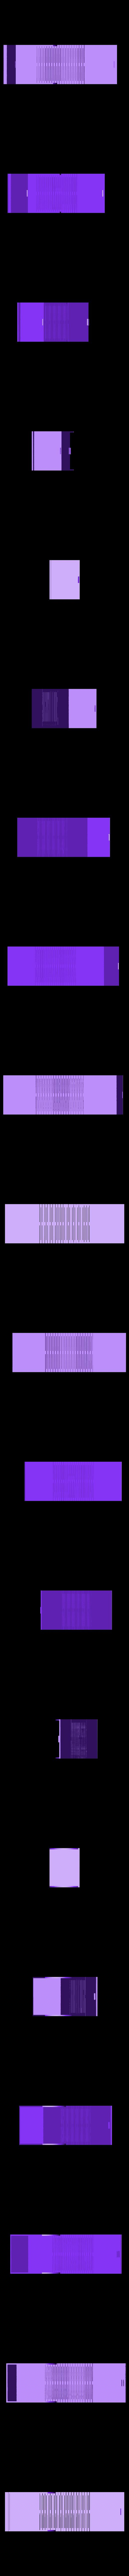 box.stl Download STL file Living hinge box #1 • Design to 3D print, the-lazy-engineer